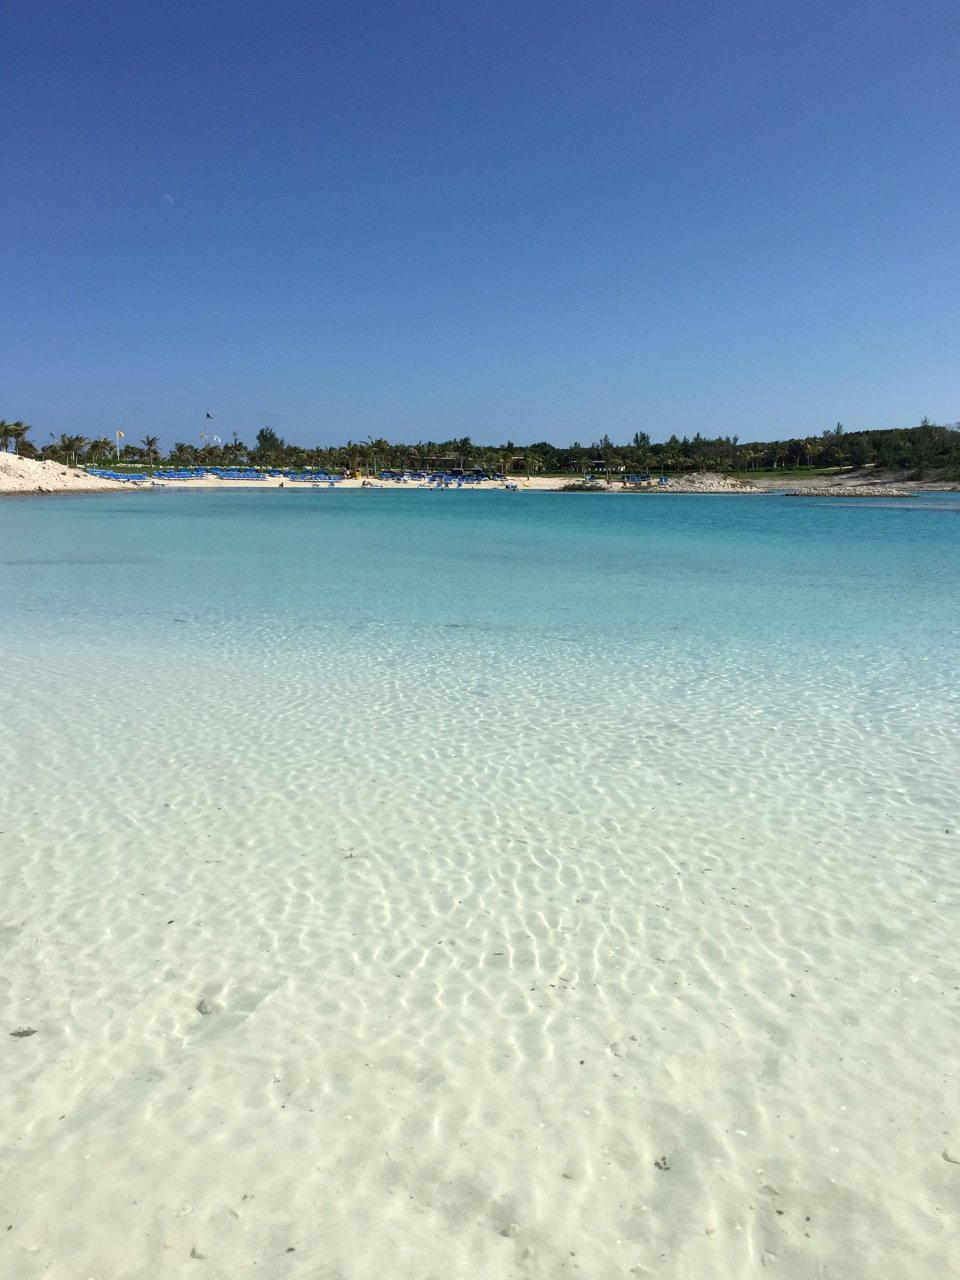 Bahamas-Cruise-Vacation-Jacksonville-Bri-Cibene-Photography_0441